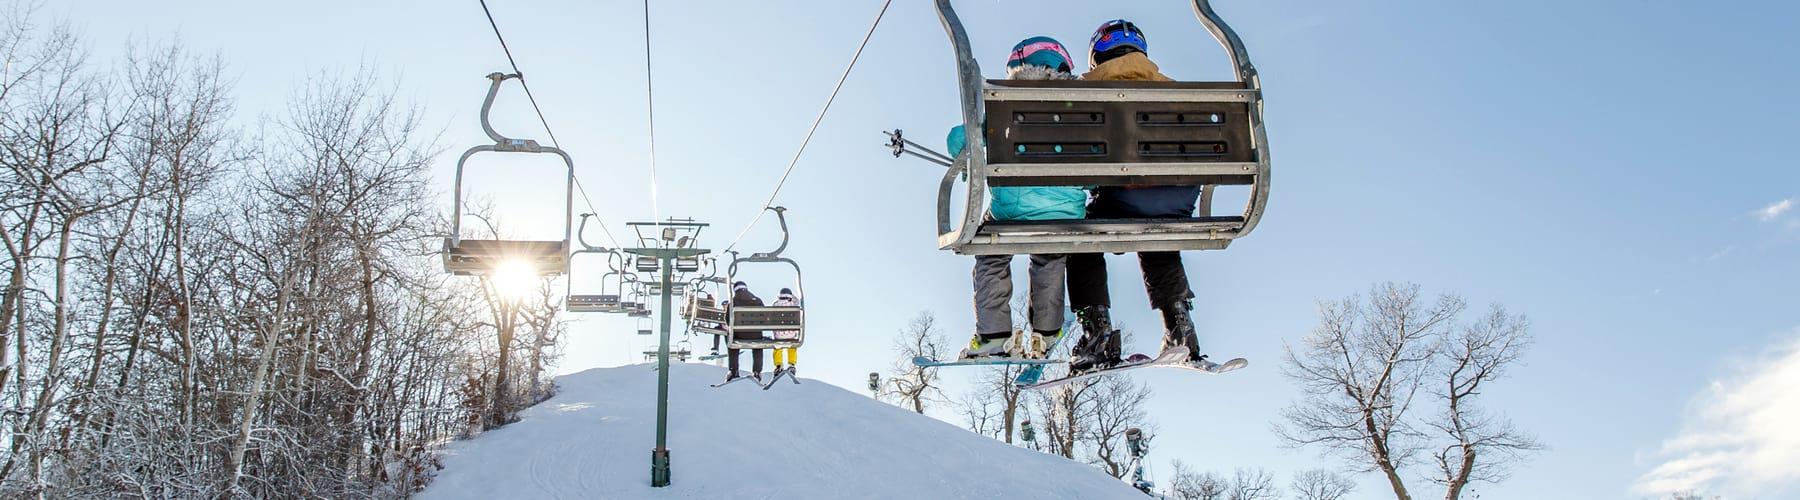 Skiers on Chairlift at Grand Geneva Resort